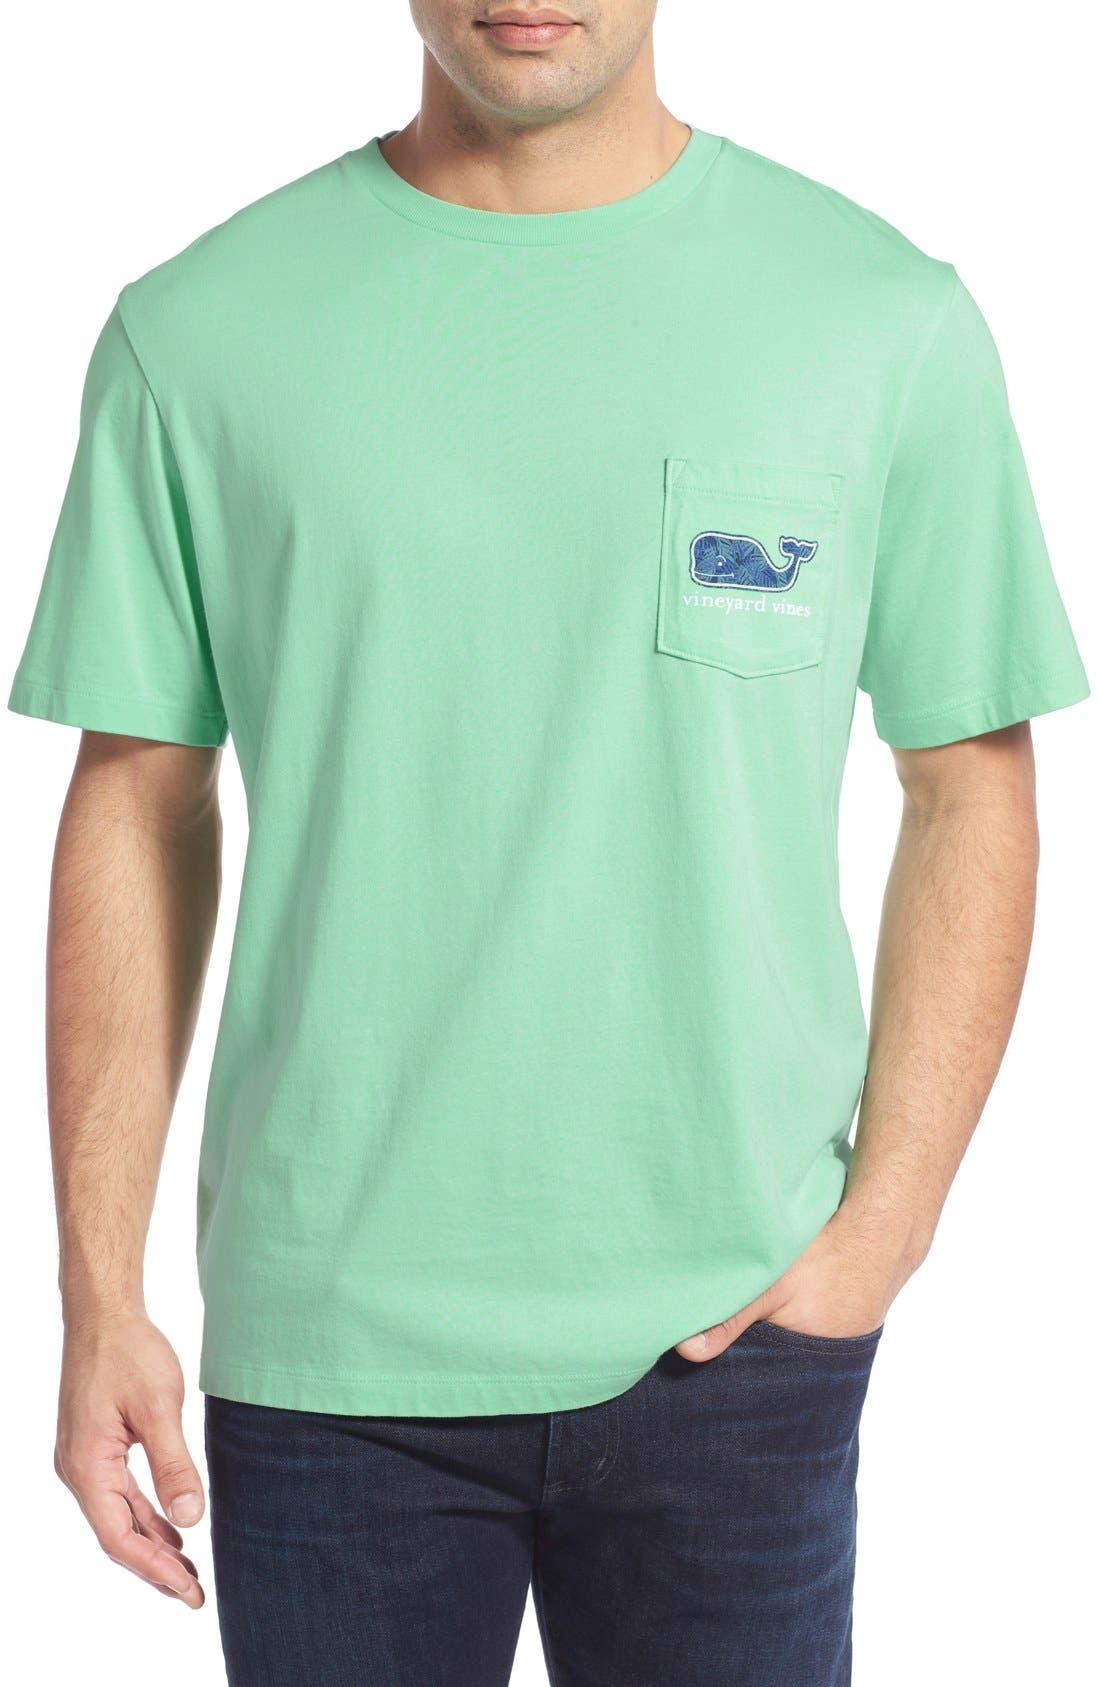 Alternate Image 2  - Vineyard Vines 'Date Palm Whale' Graphic T-Shirt